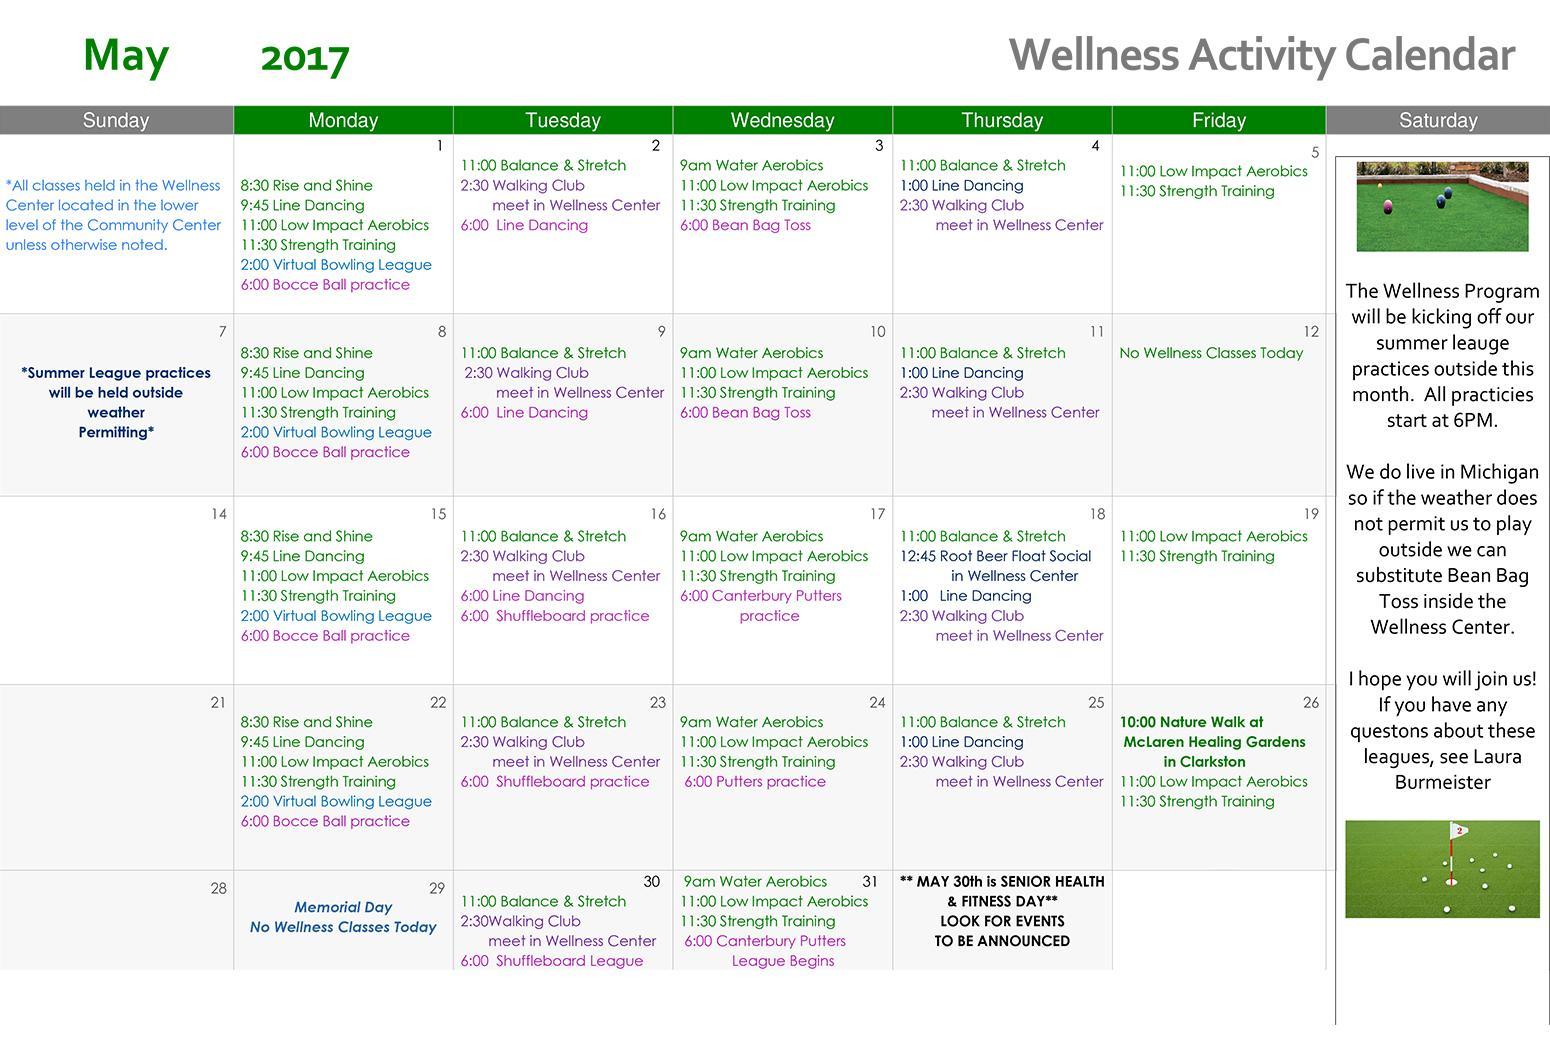 May Wellness